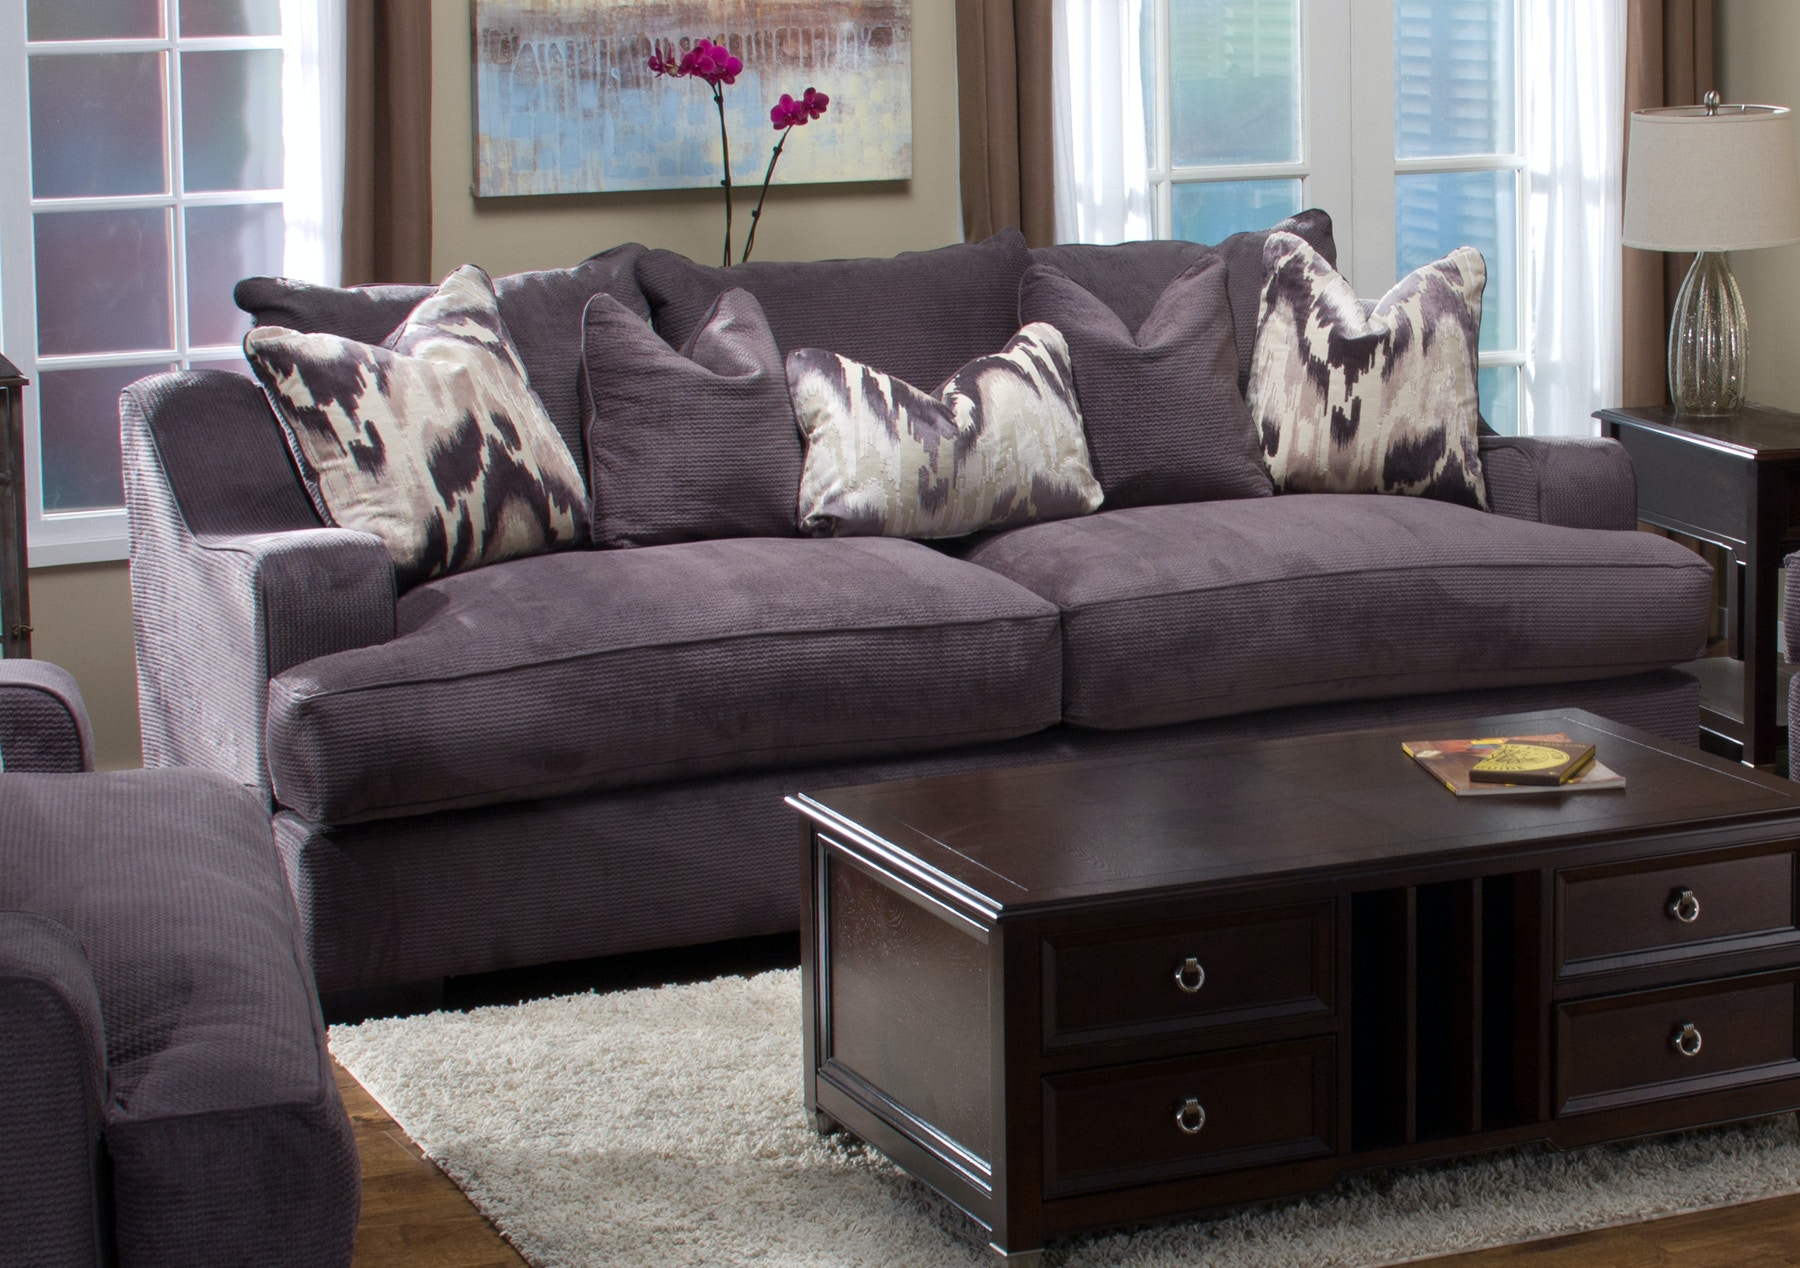 michael nicholas aspen sofa paula deen and loveseat designs living room ettica 043685